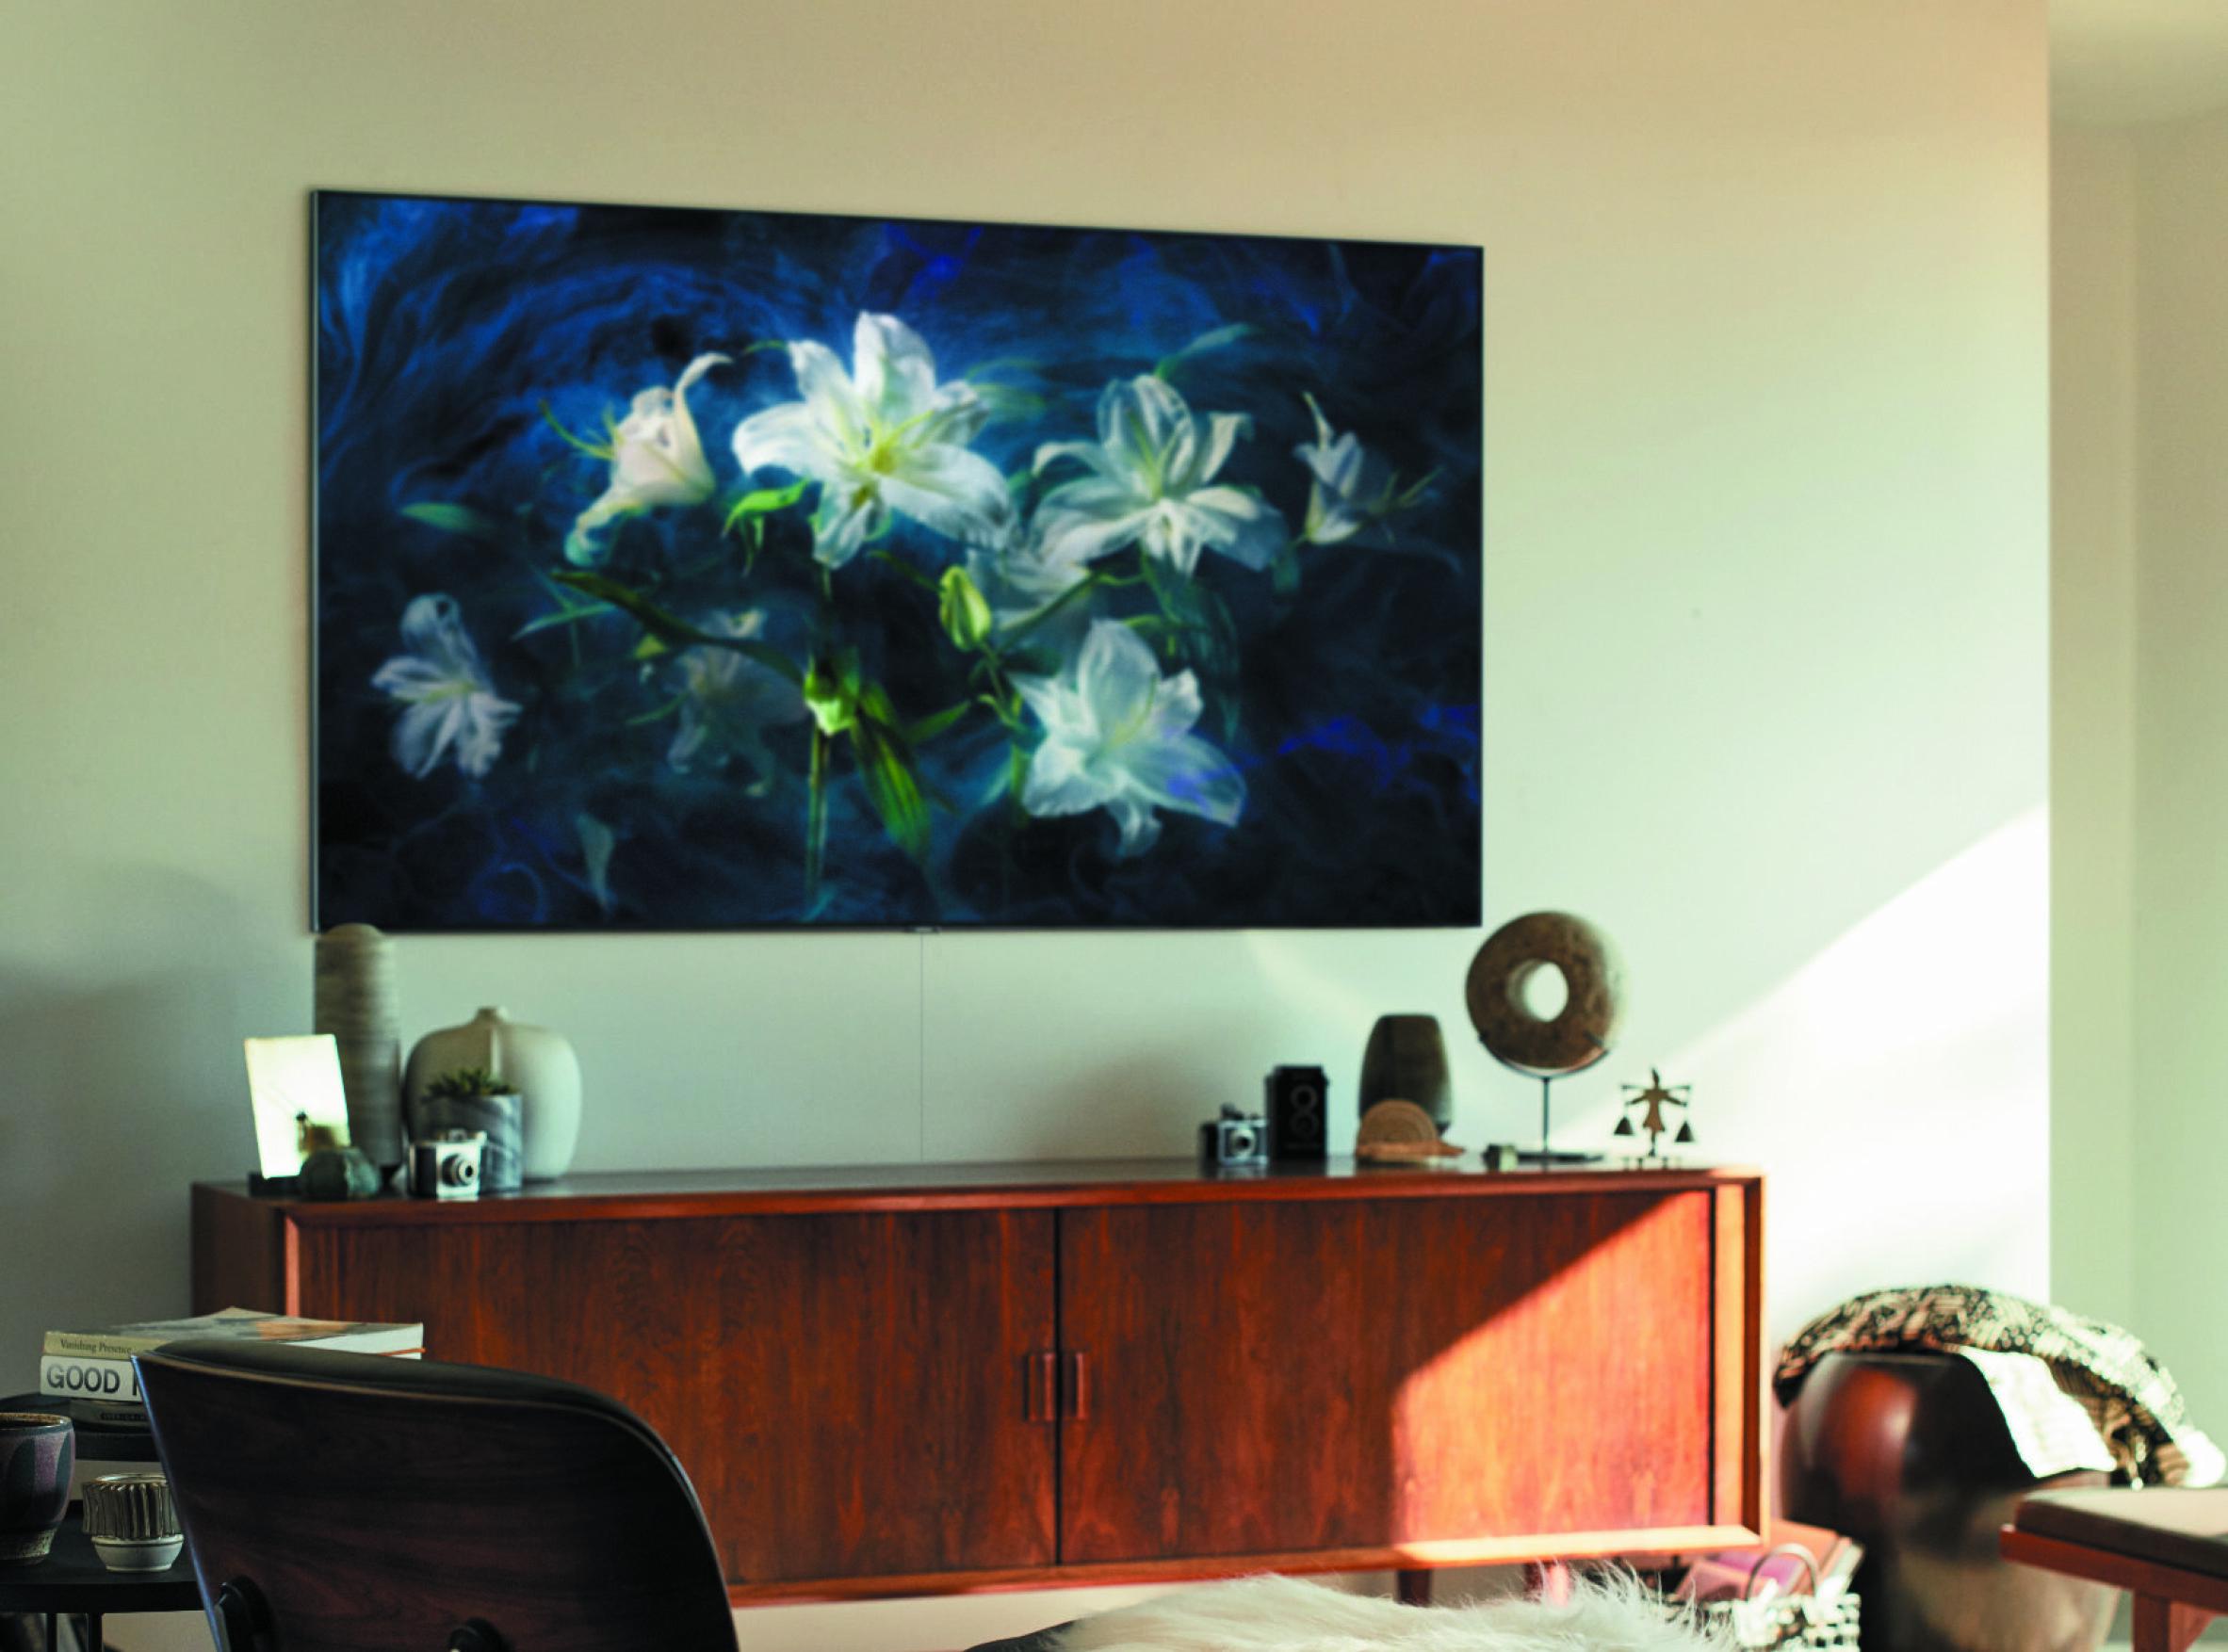 FARGERIK: Samsung QLED TV imponererer både med farger og sortnivå.